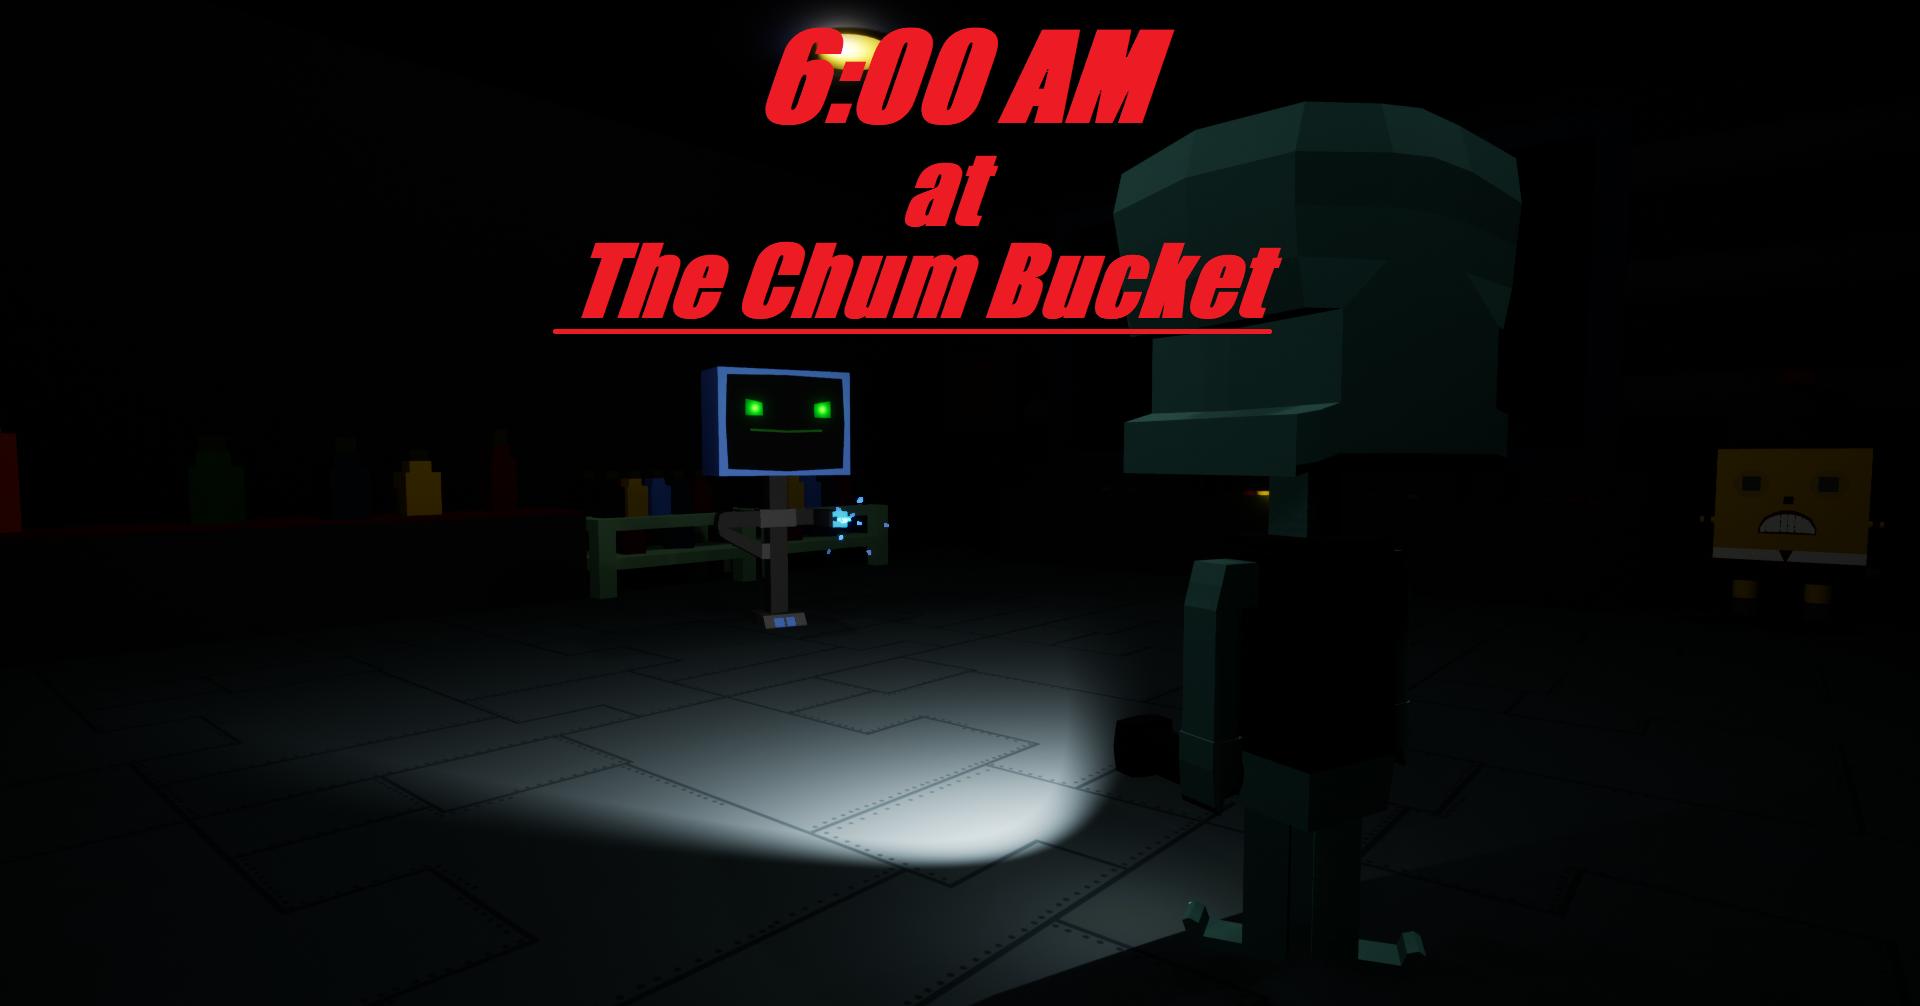 DEATH AT THE CHUM BUCKET! | 6AM At The Chum Bucket | Free